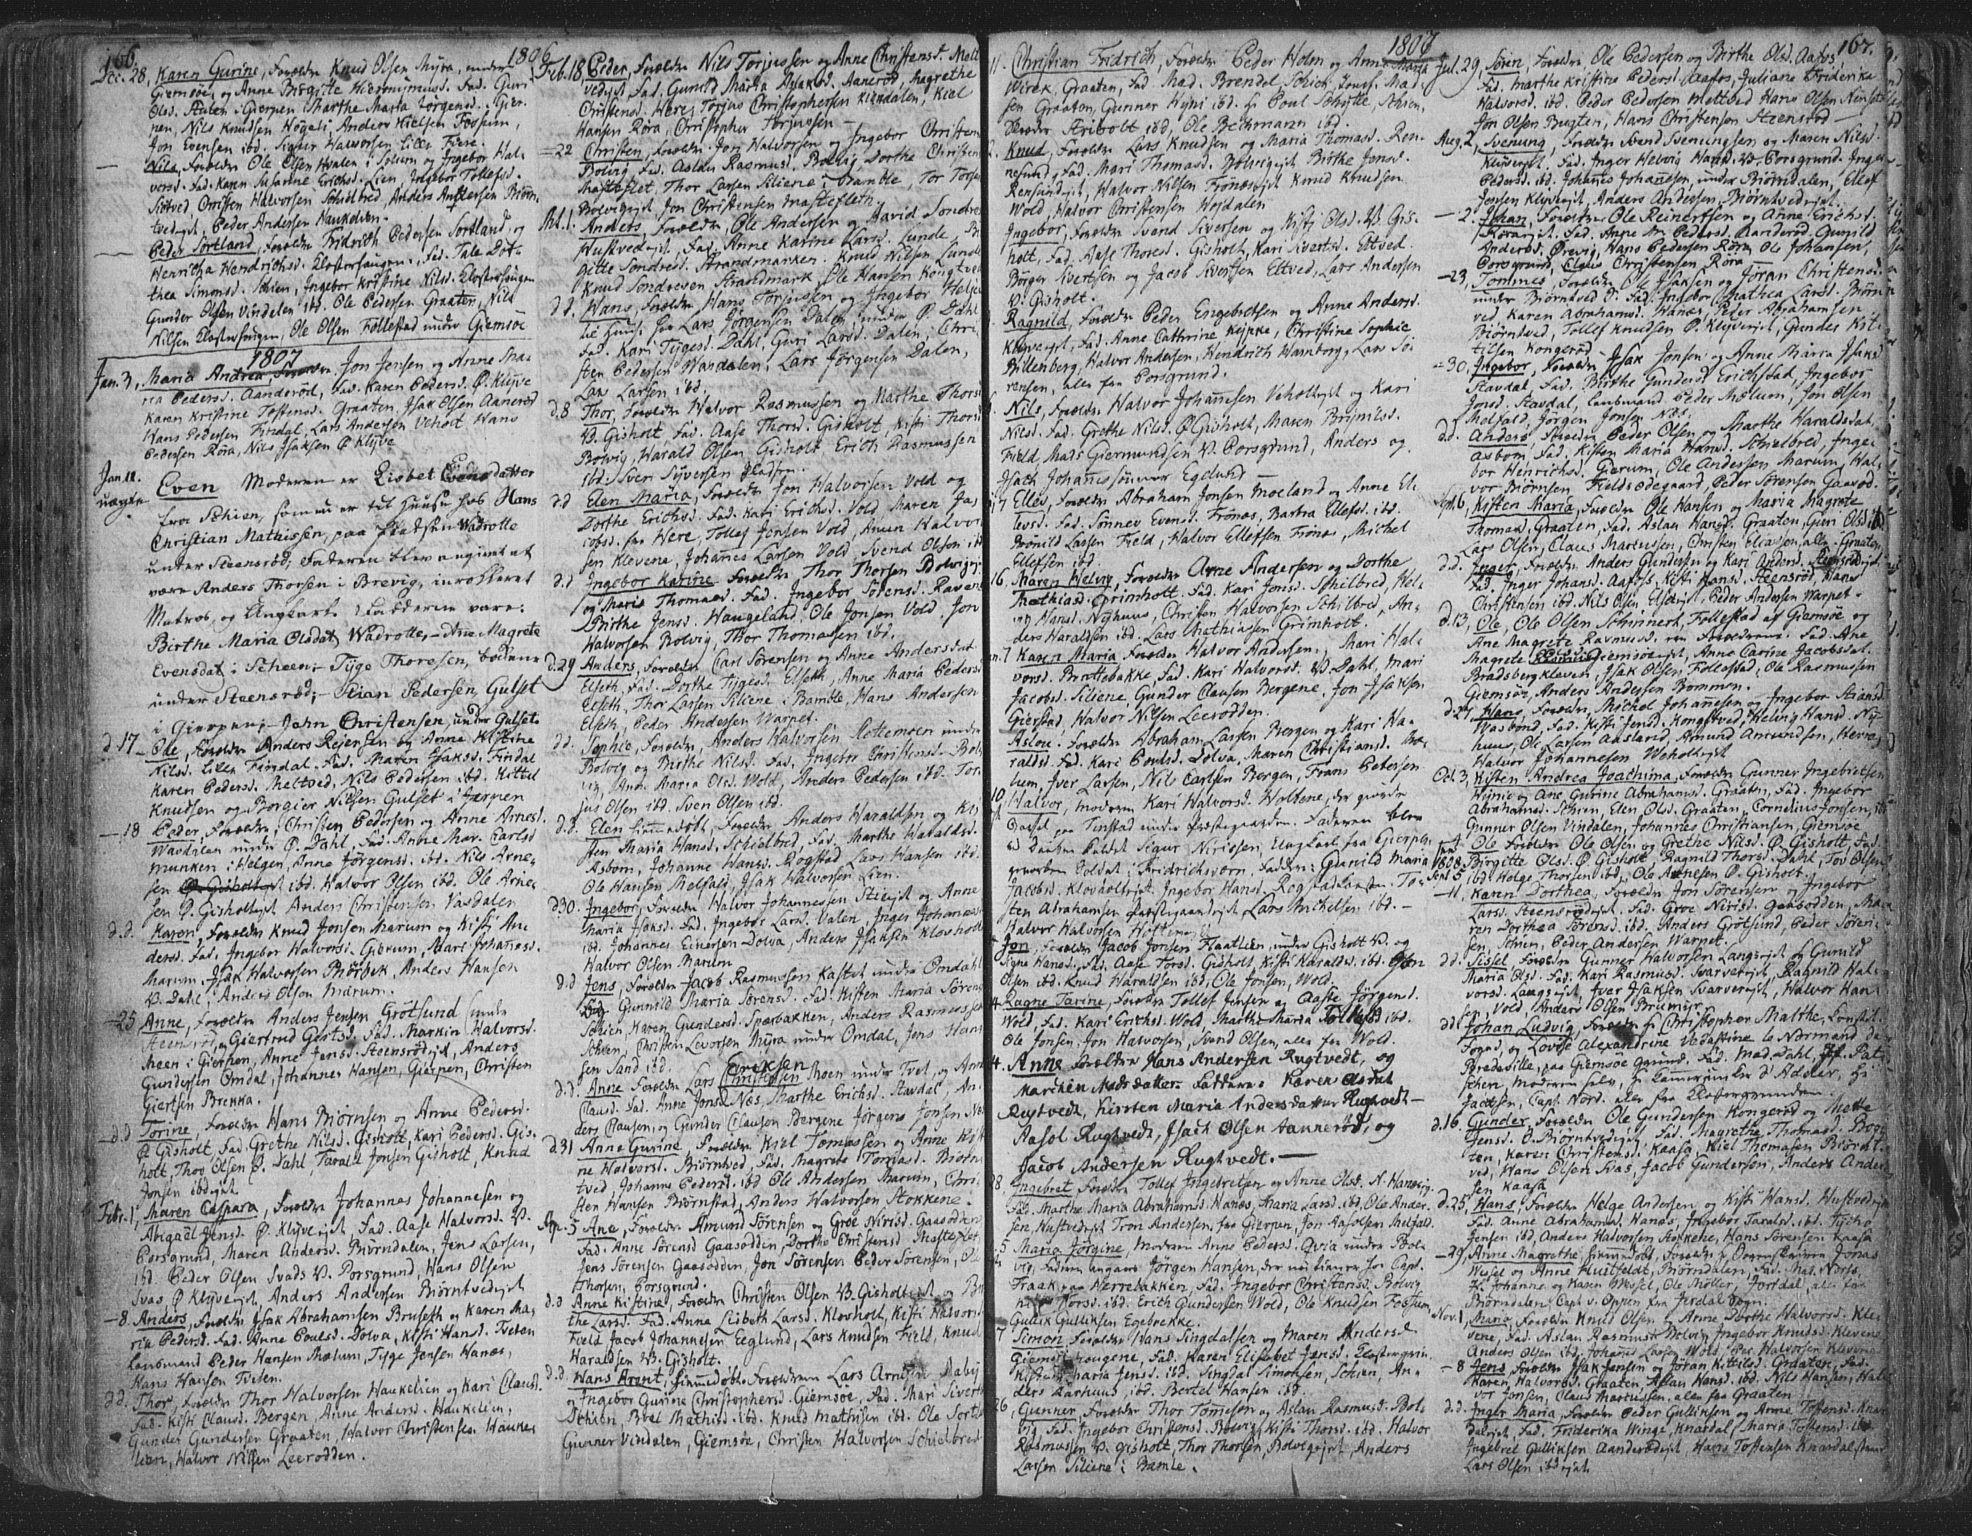 SAKO, Solum kirkebøker, F/Fa/L0003: Ministerialbok nr. I 3, 1761-1814, s. 166-167